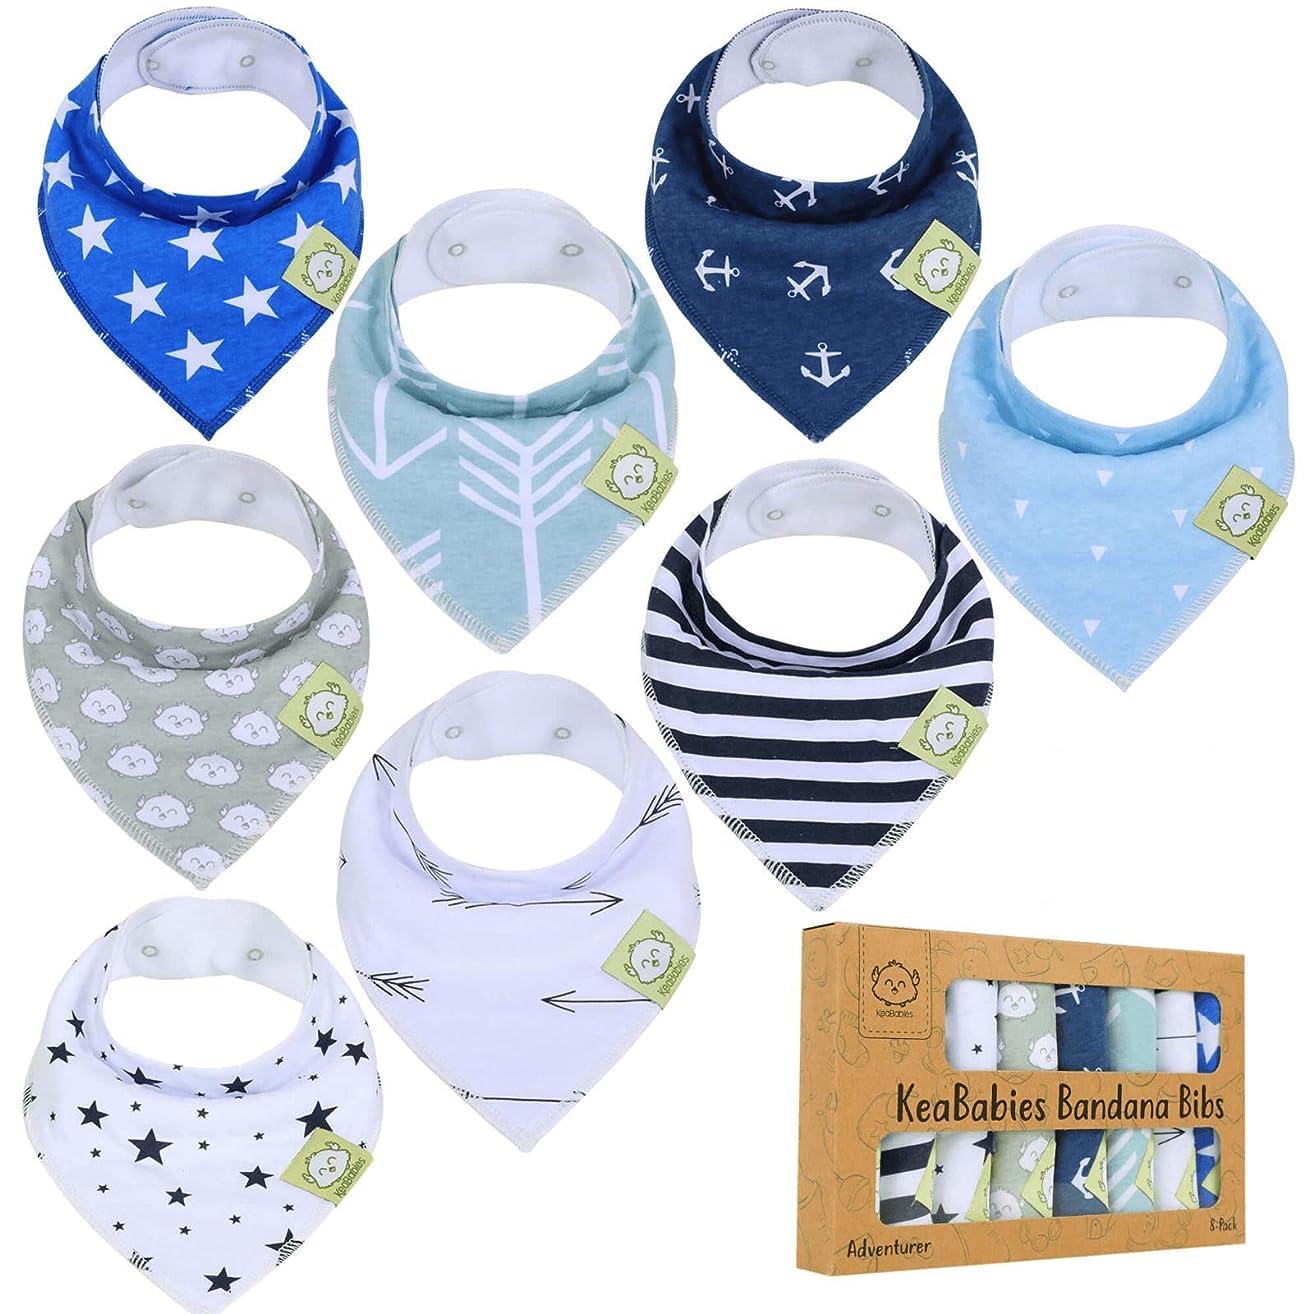 Baby Bandana Drool Bibs for Boys by KeaBabies - Super Absorbent Bandana Bibs - Baby Drool Bib - Teething Bibs - Handkerchief Bibs for Infant, Toddler - 8-Pack Bib Set - Bib Boy (Adventurer)